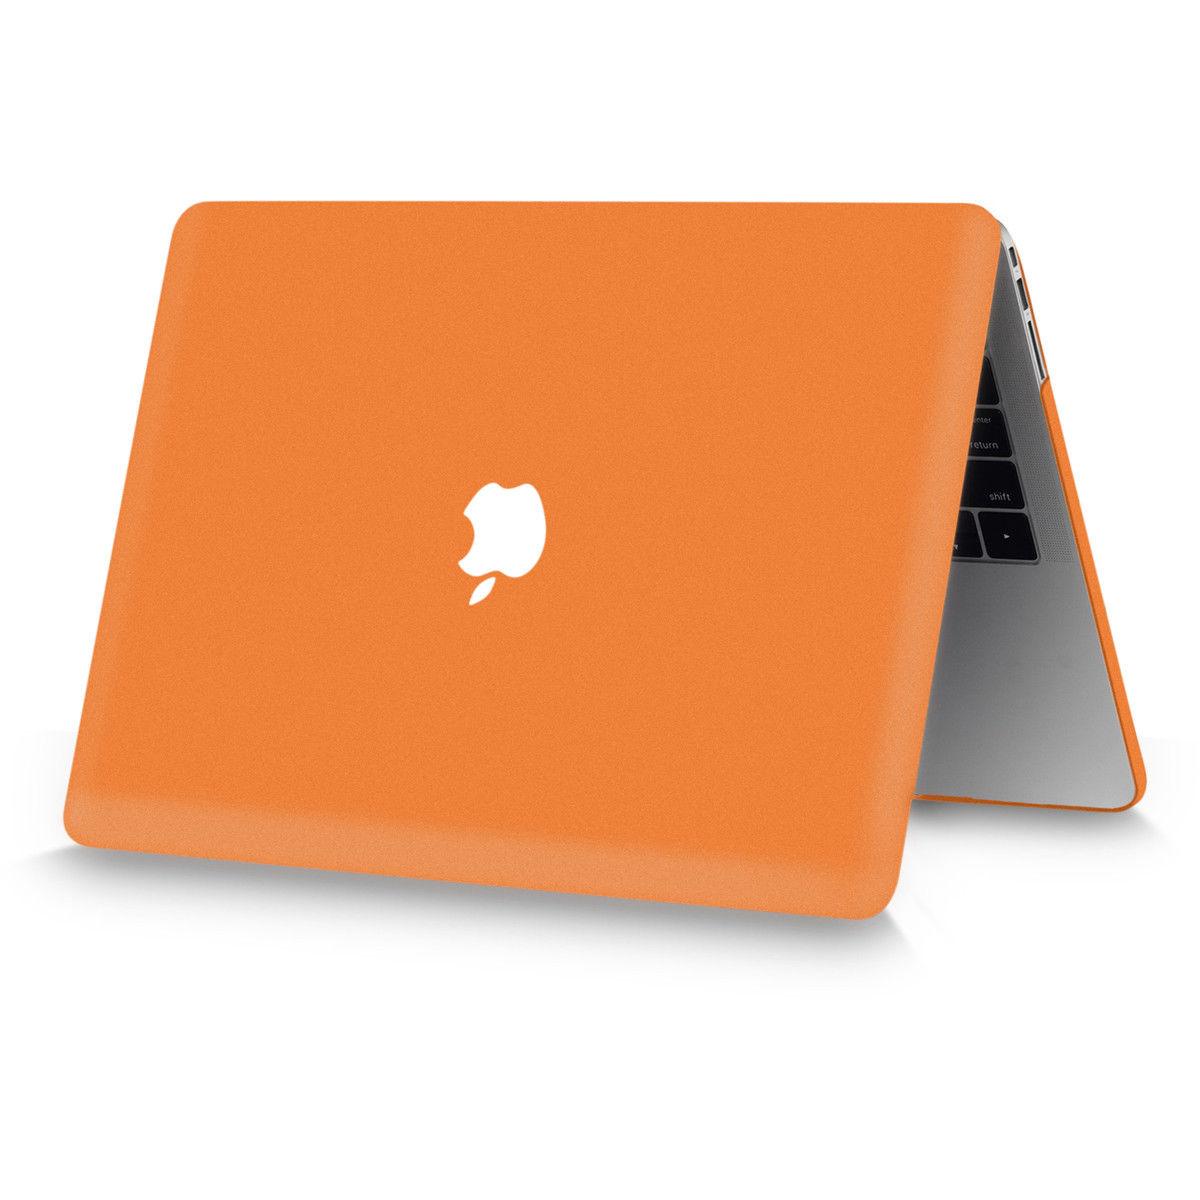 Matte Rubberized Hard Case with Keyboard Skin for Apple MacBook Pro 13 Retina